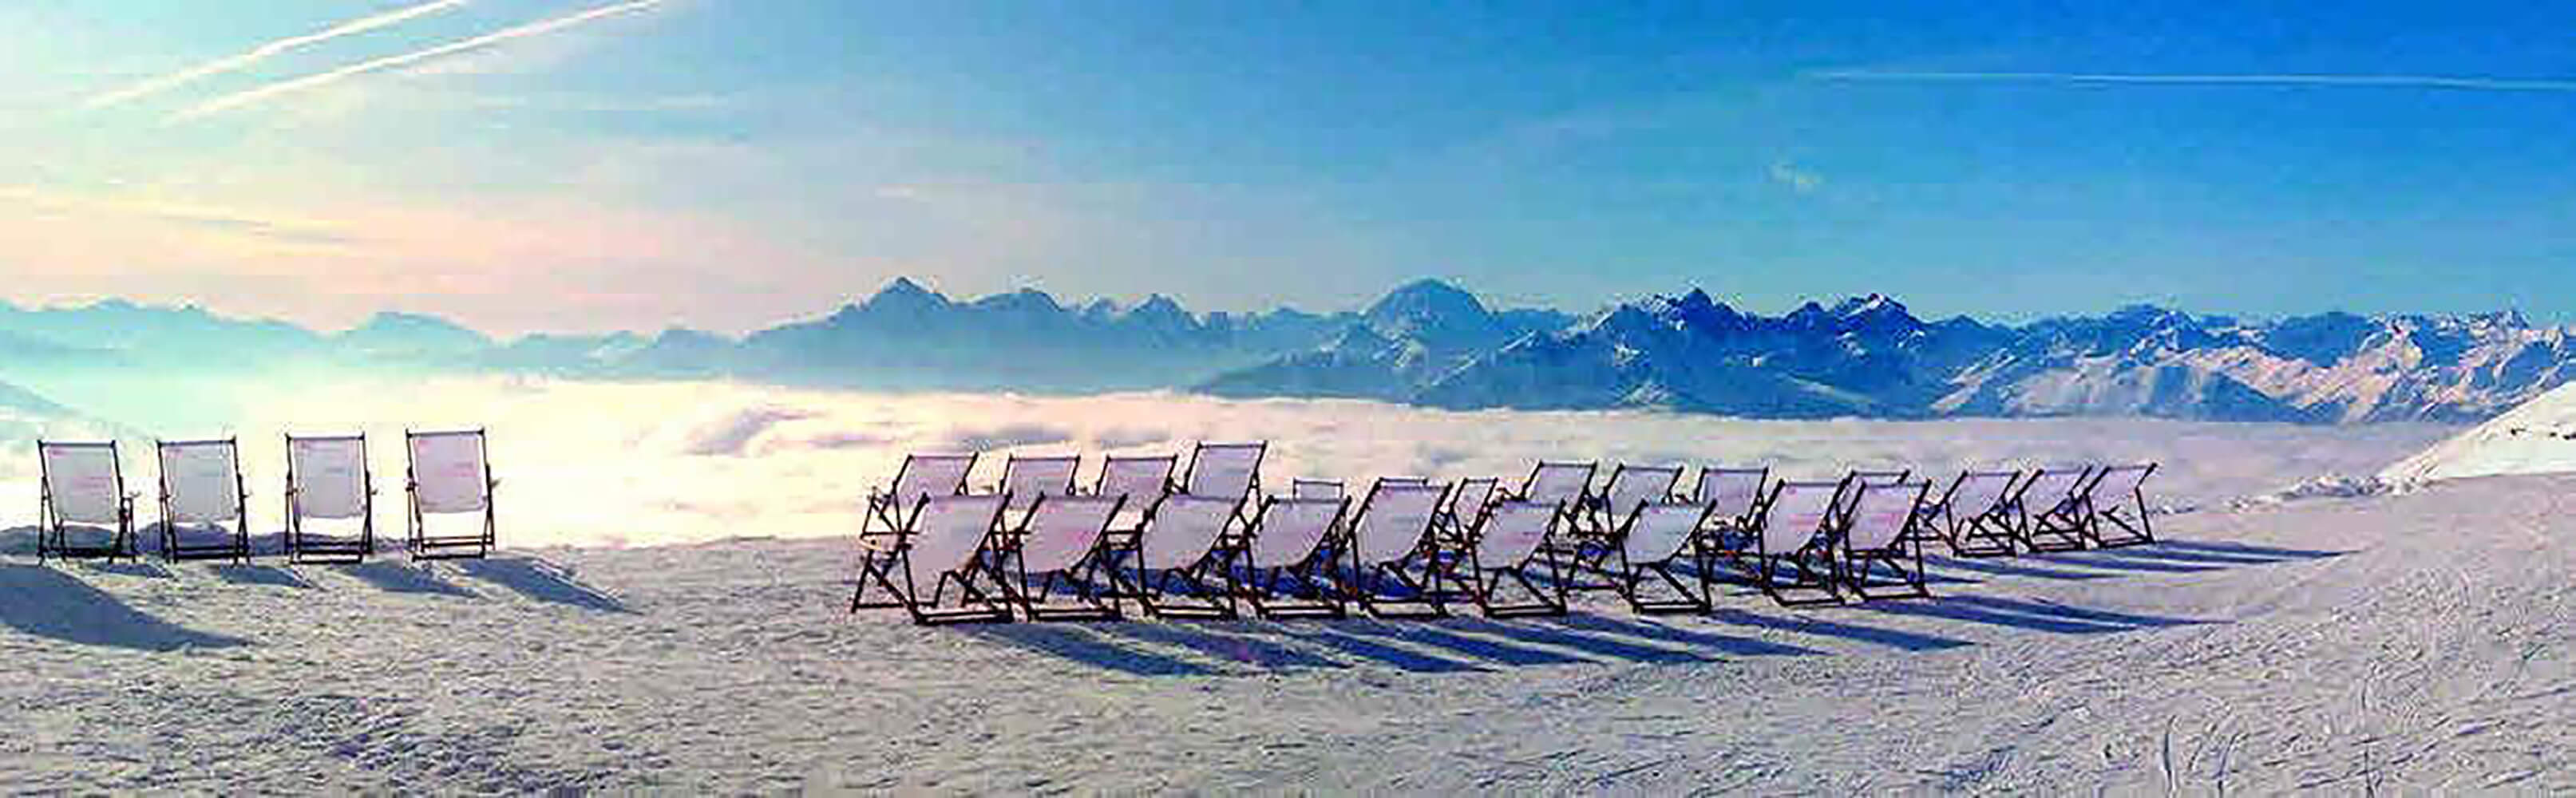 Olympia SkiWorld – Nordkettenbahnen Innsbruck 1